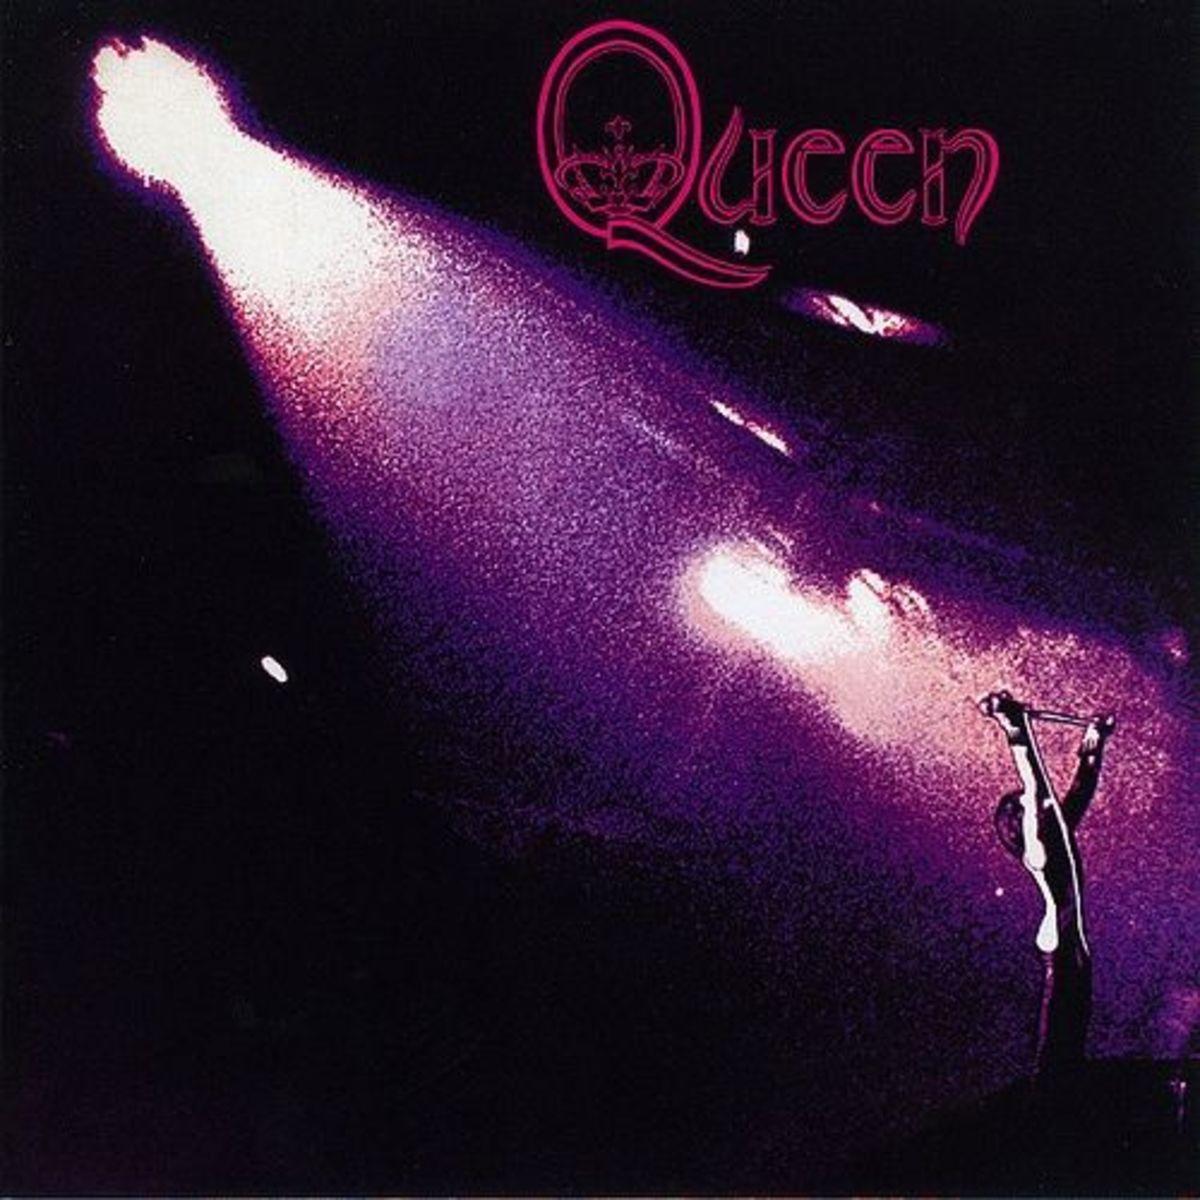 "Queen ""Queen"" Elektra Records EKS-75064 12"" LP Vinyl Record (1973) Album Cover Art by Freddie Mercury"